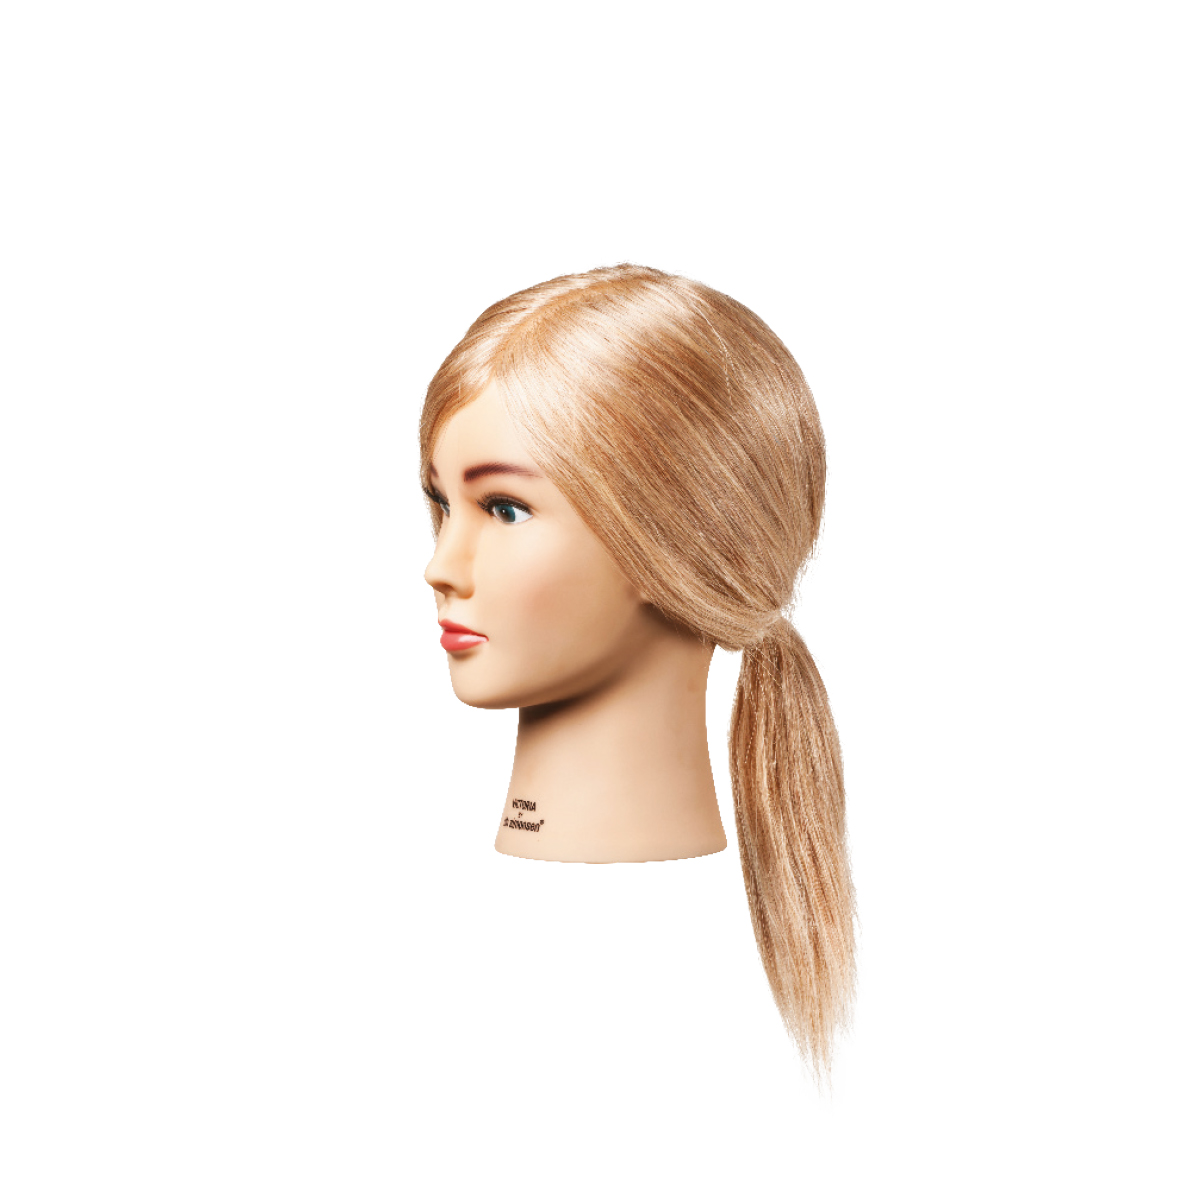 Testamodella victoria capelli veri 30 cm – biondi** MINUTERIA VARIA IN ASSORTIMENT